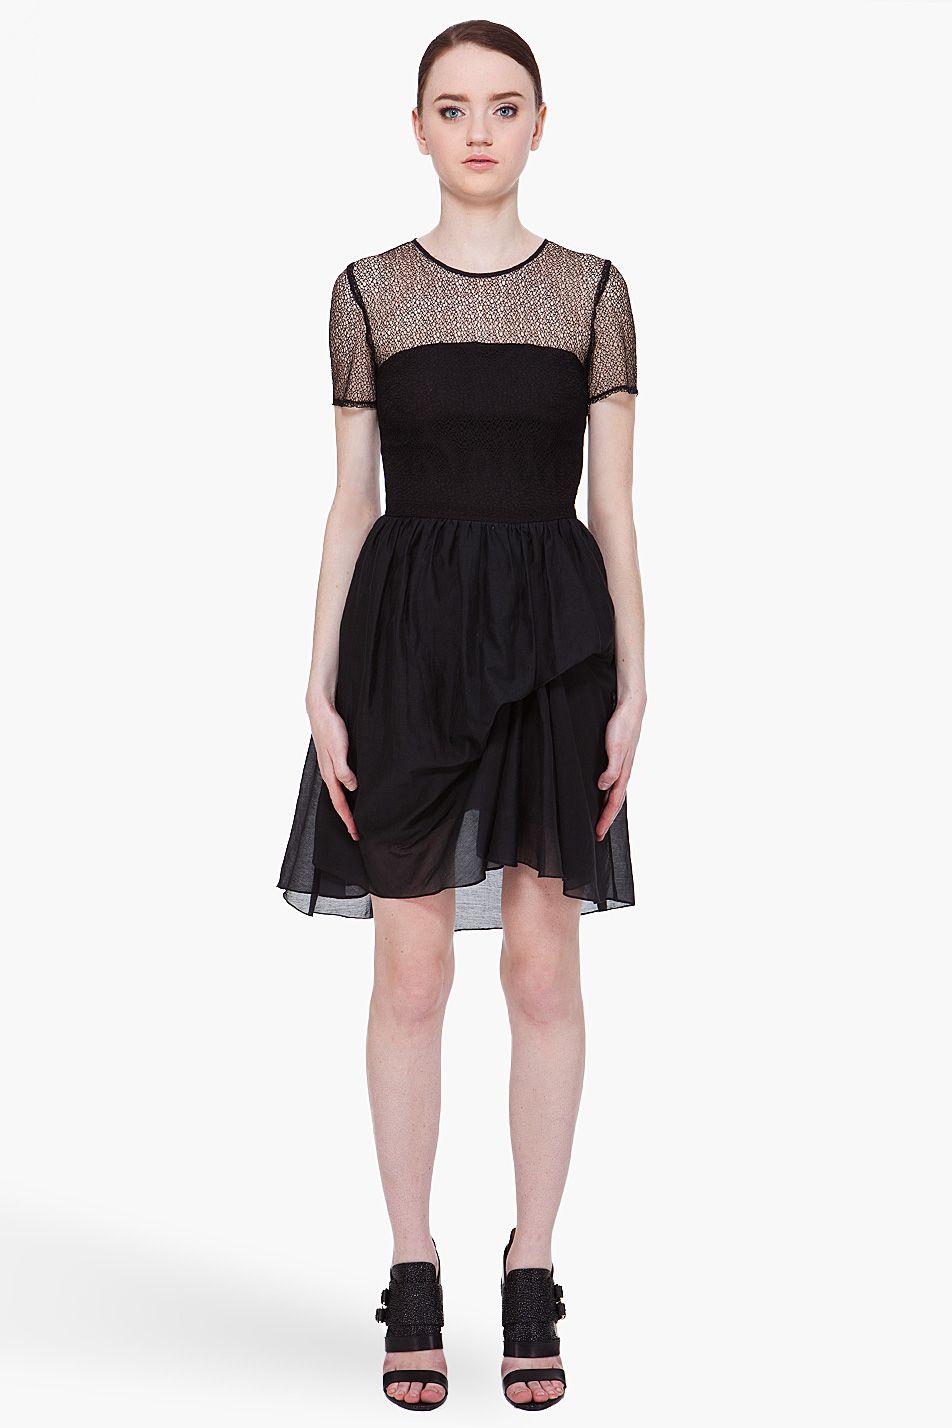 Mesh Top Dress Mesh Top Dress Dresses Fashion [ 1428 x 952 Pixel ]